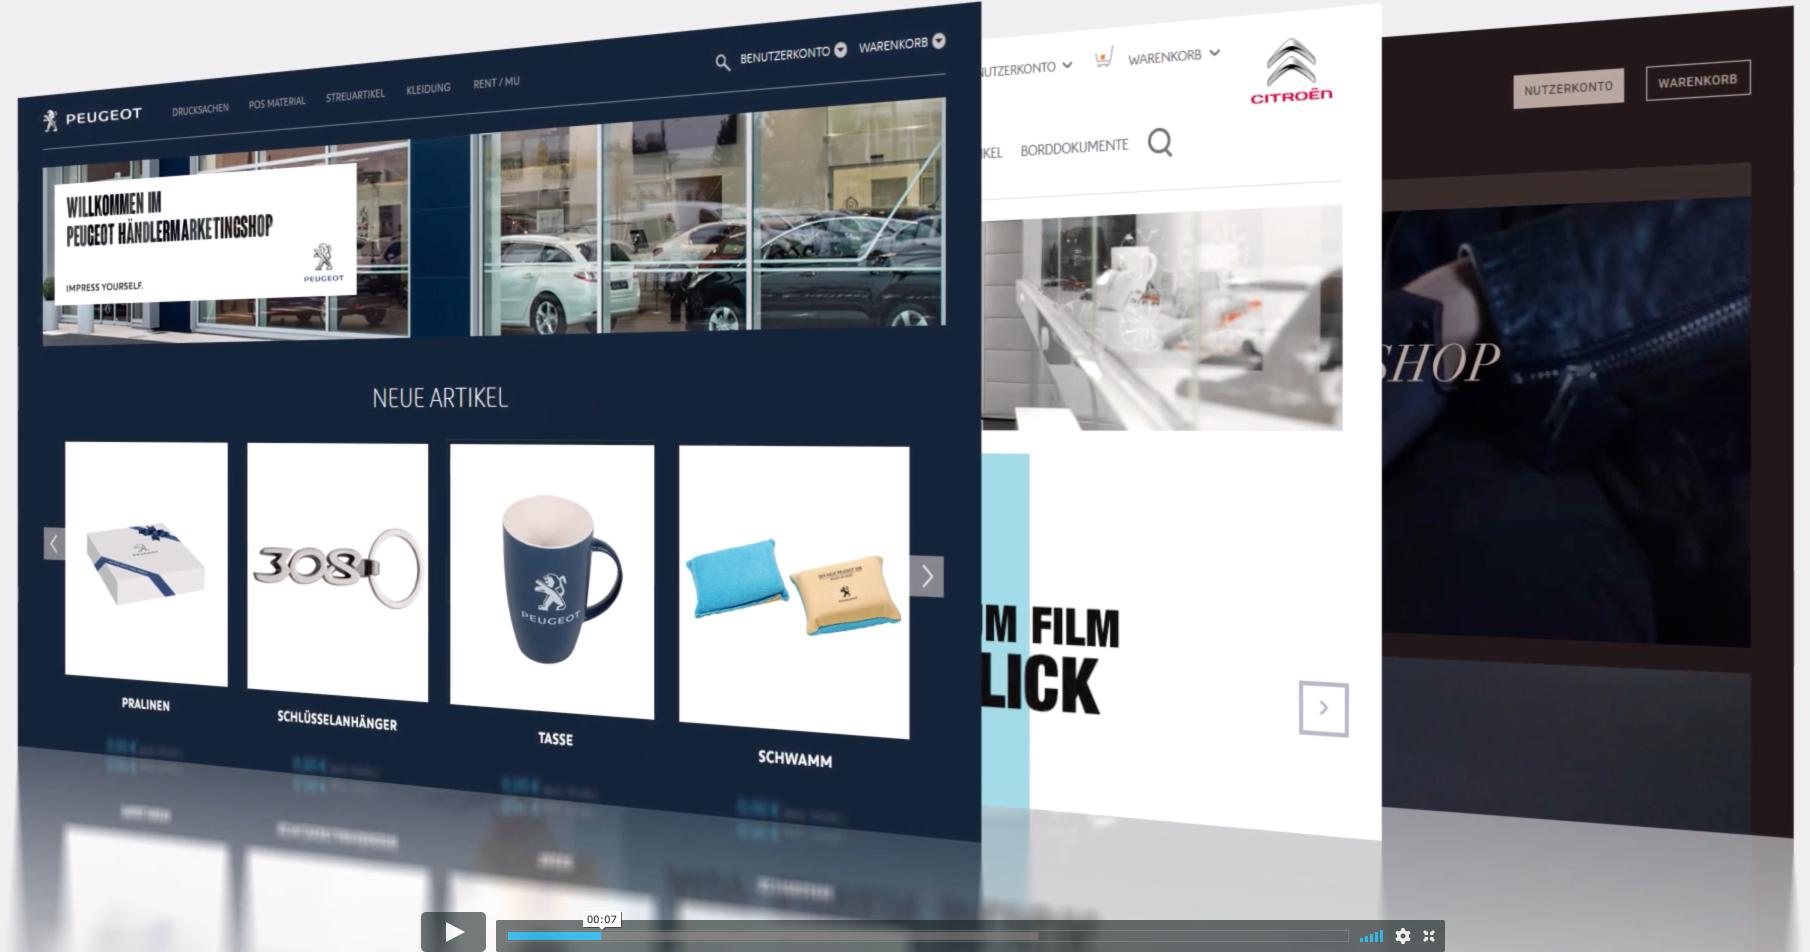 Peugeot/Citroén B2B and B2C E-Shops